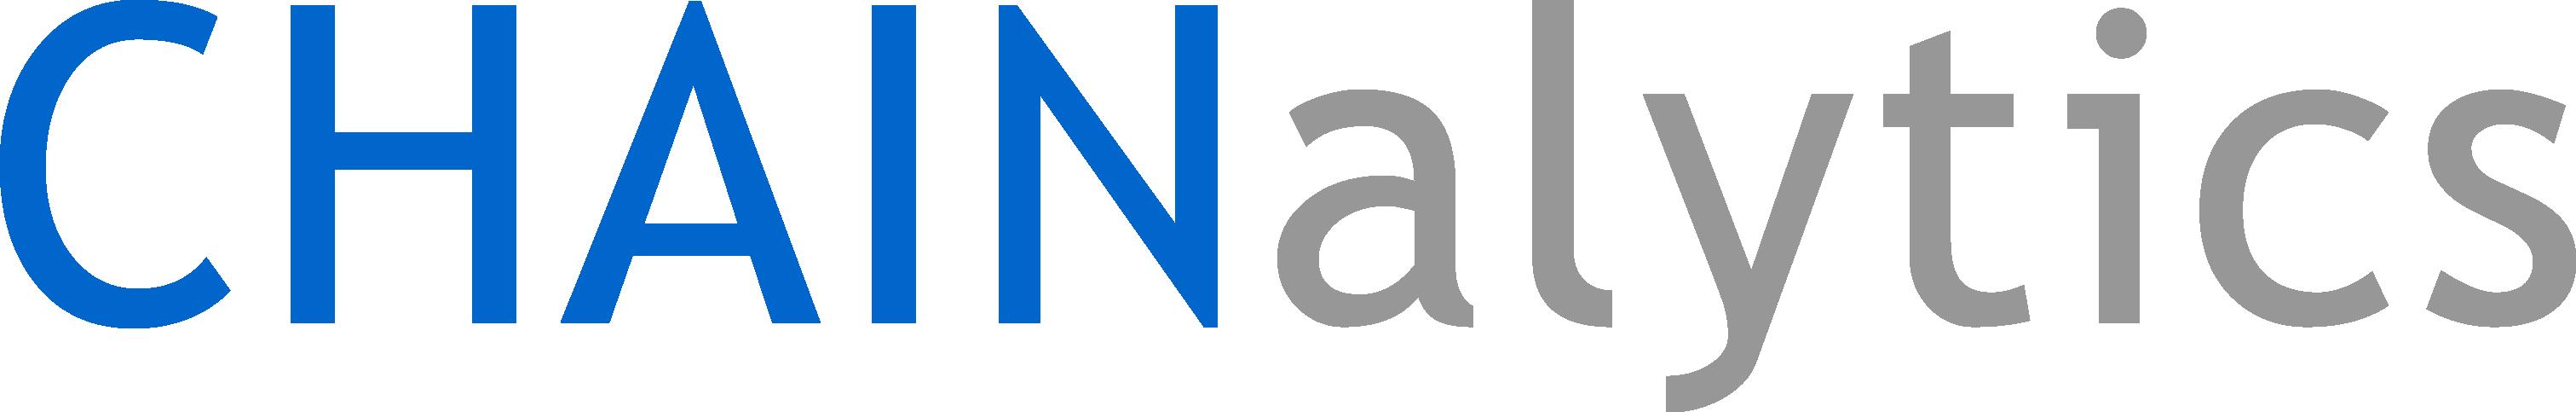 Chainalytics LogoRGB